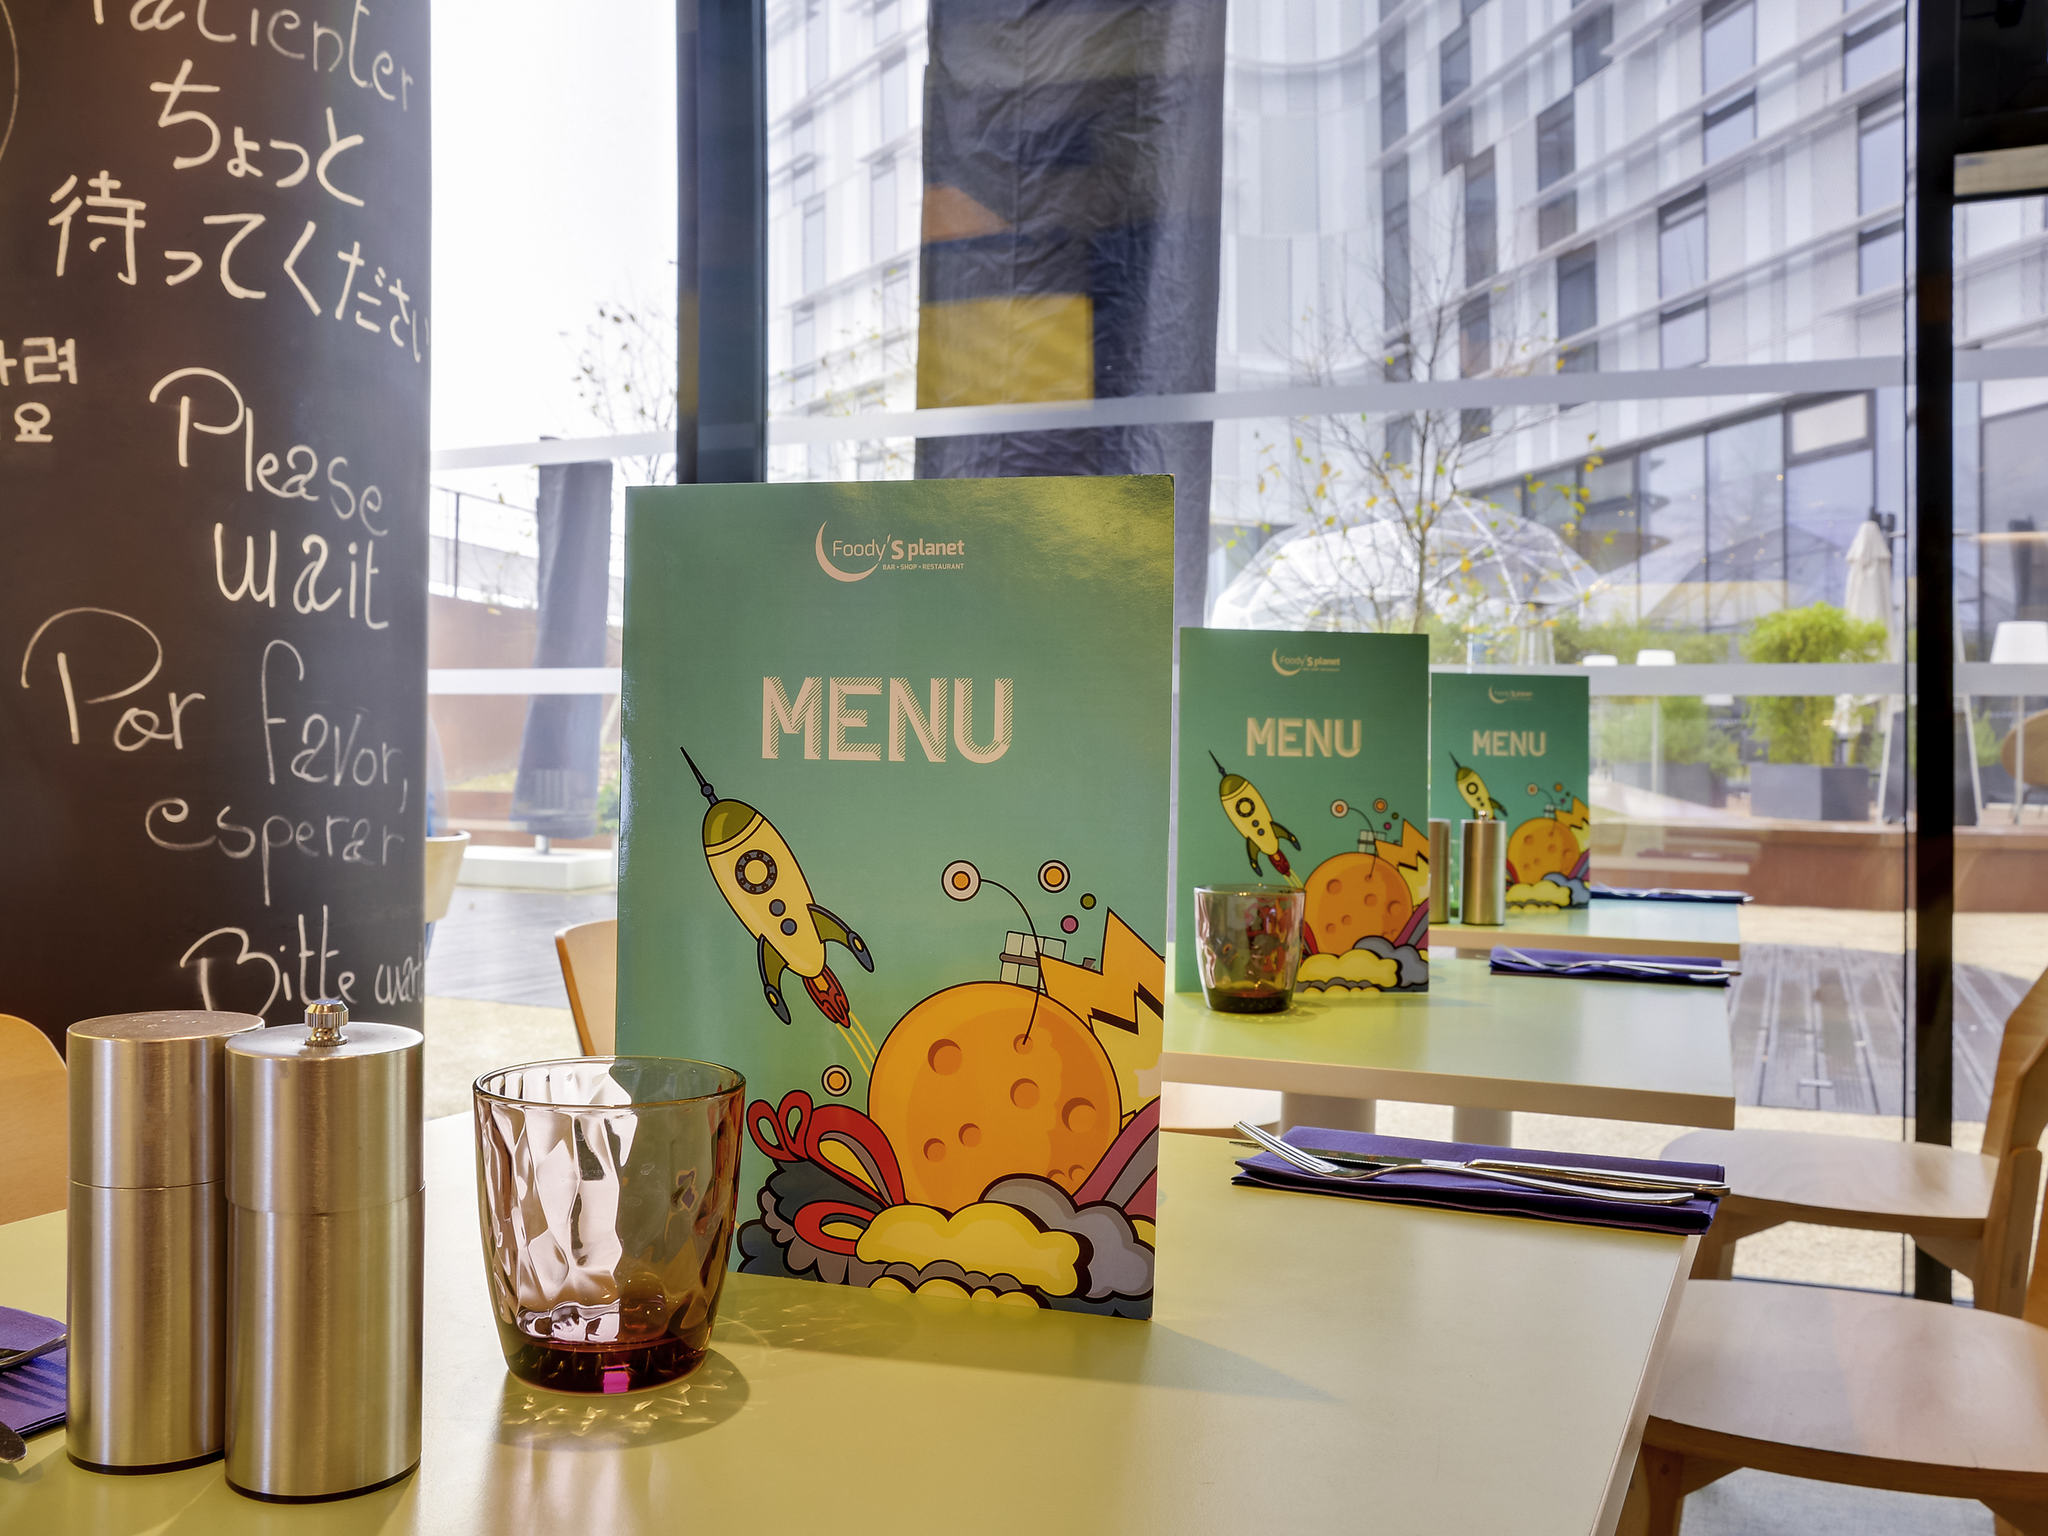 Restaurant Ibis Styles Paris Charles De Gaulle Airport